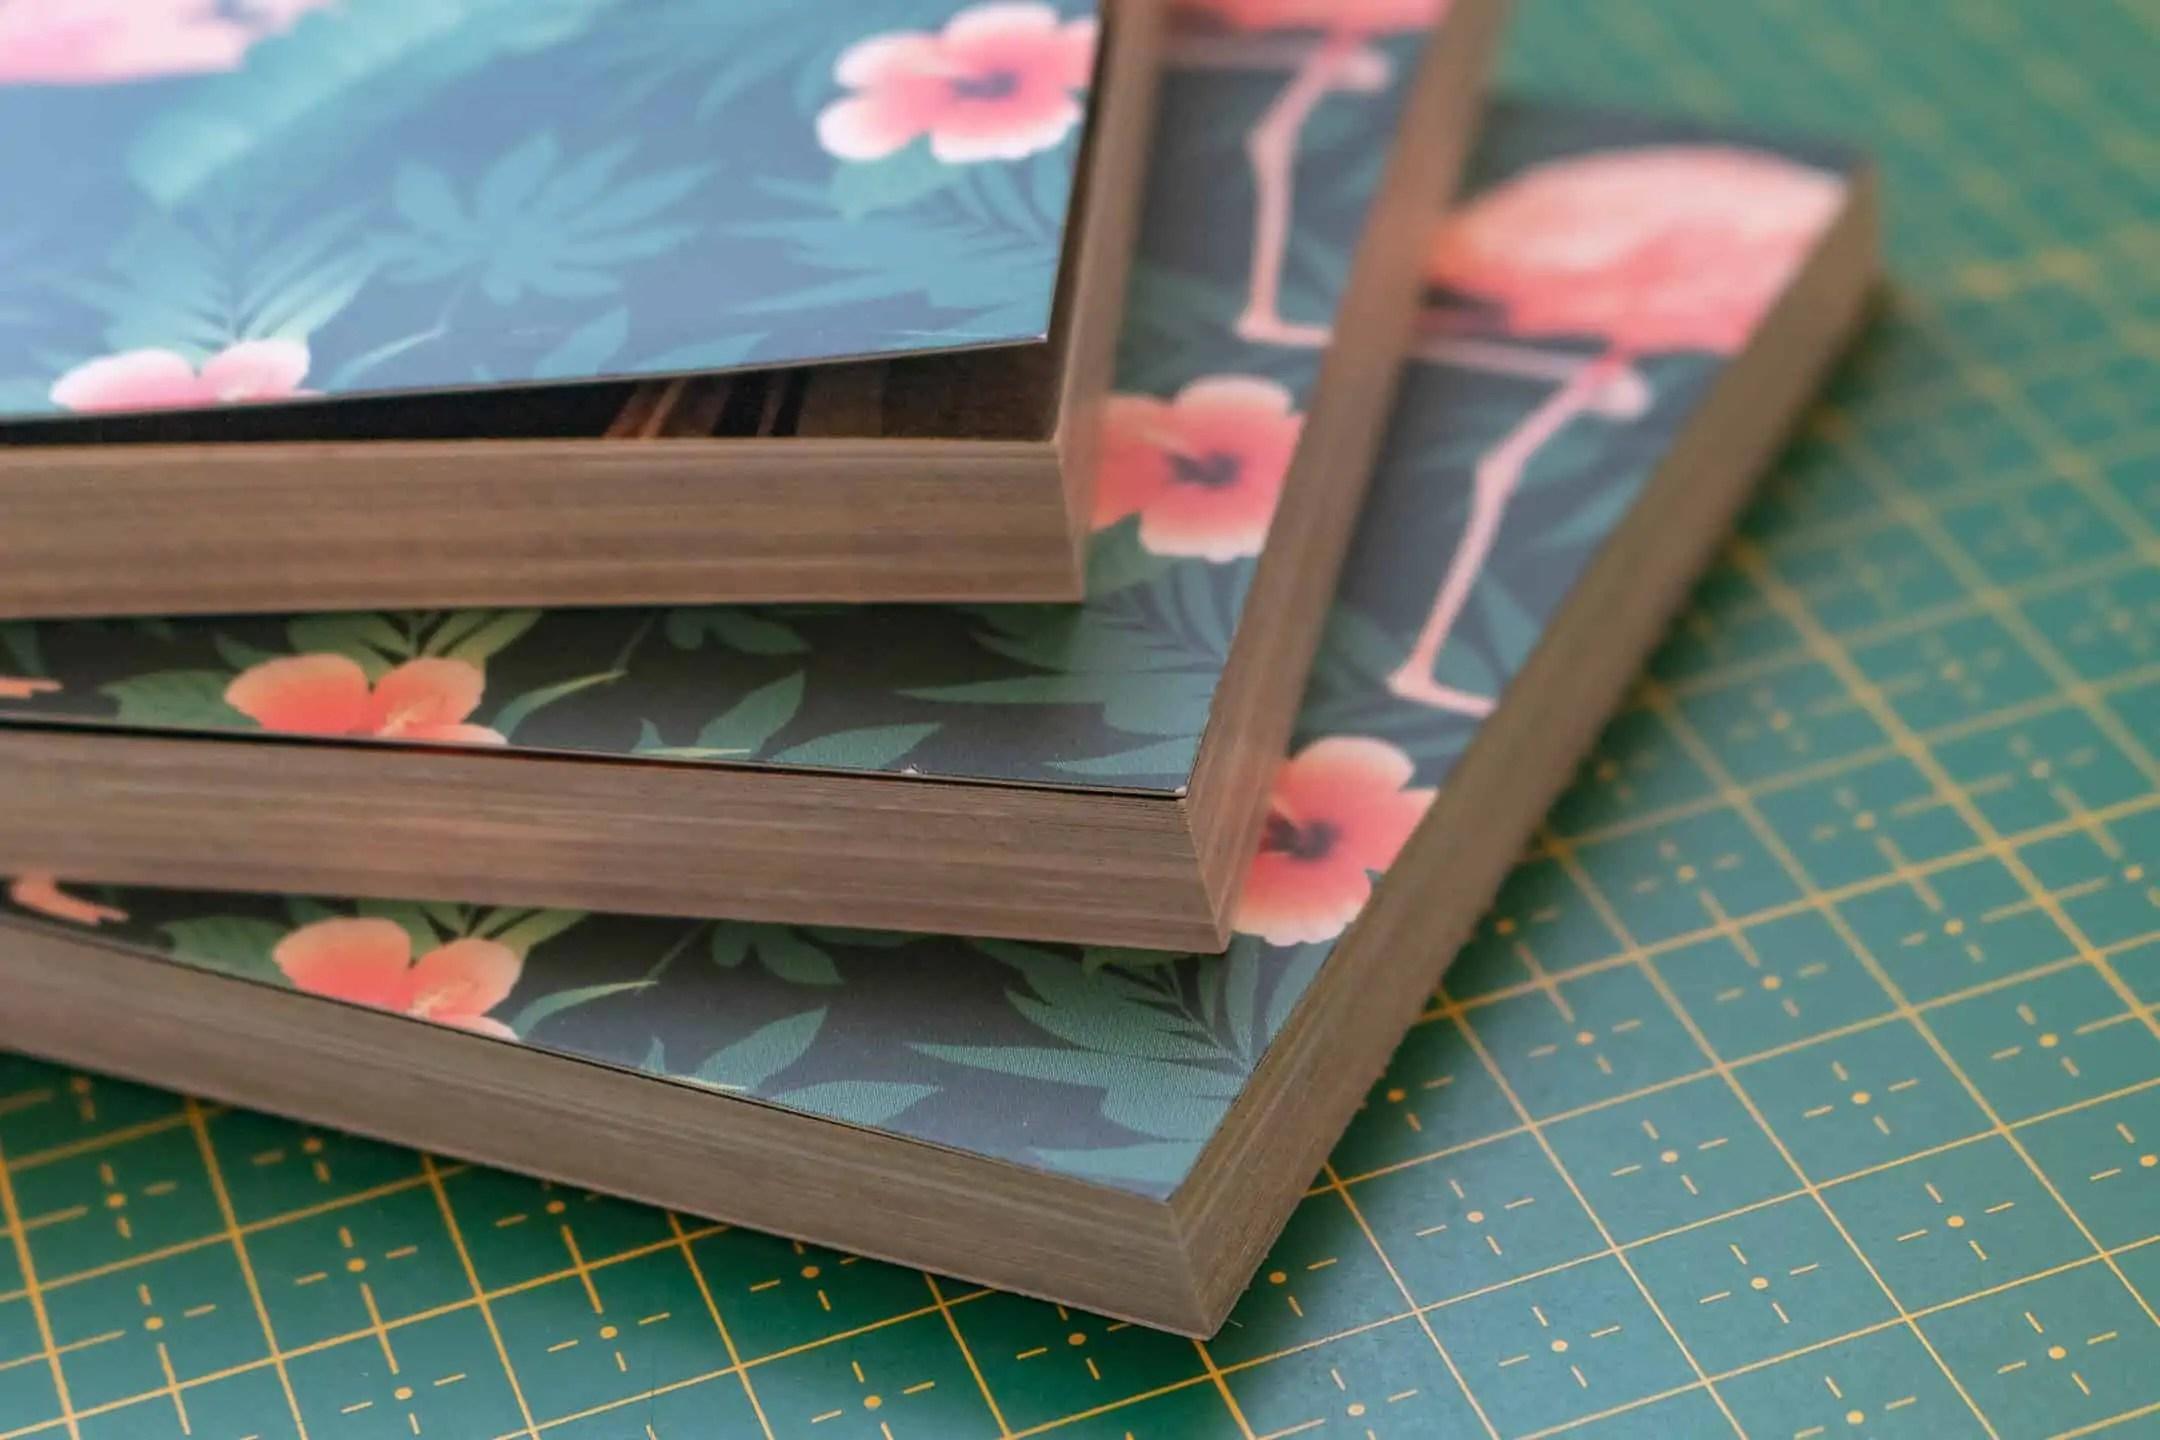 Mini ksiażka fotograficzna Pixbook 4 - Mini książka fotograficzna  Pixbook. Czy warto ?